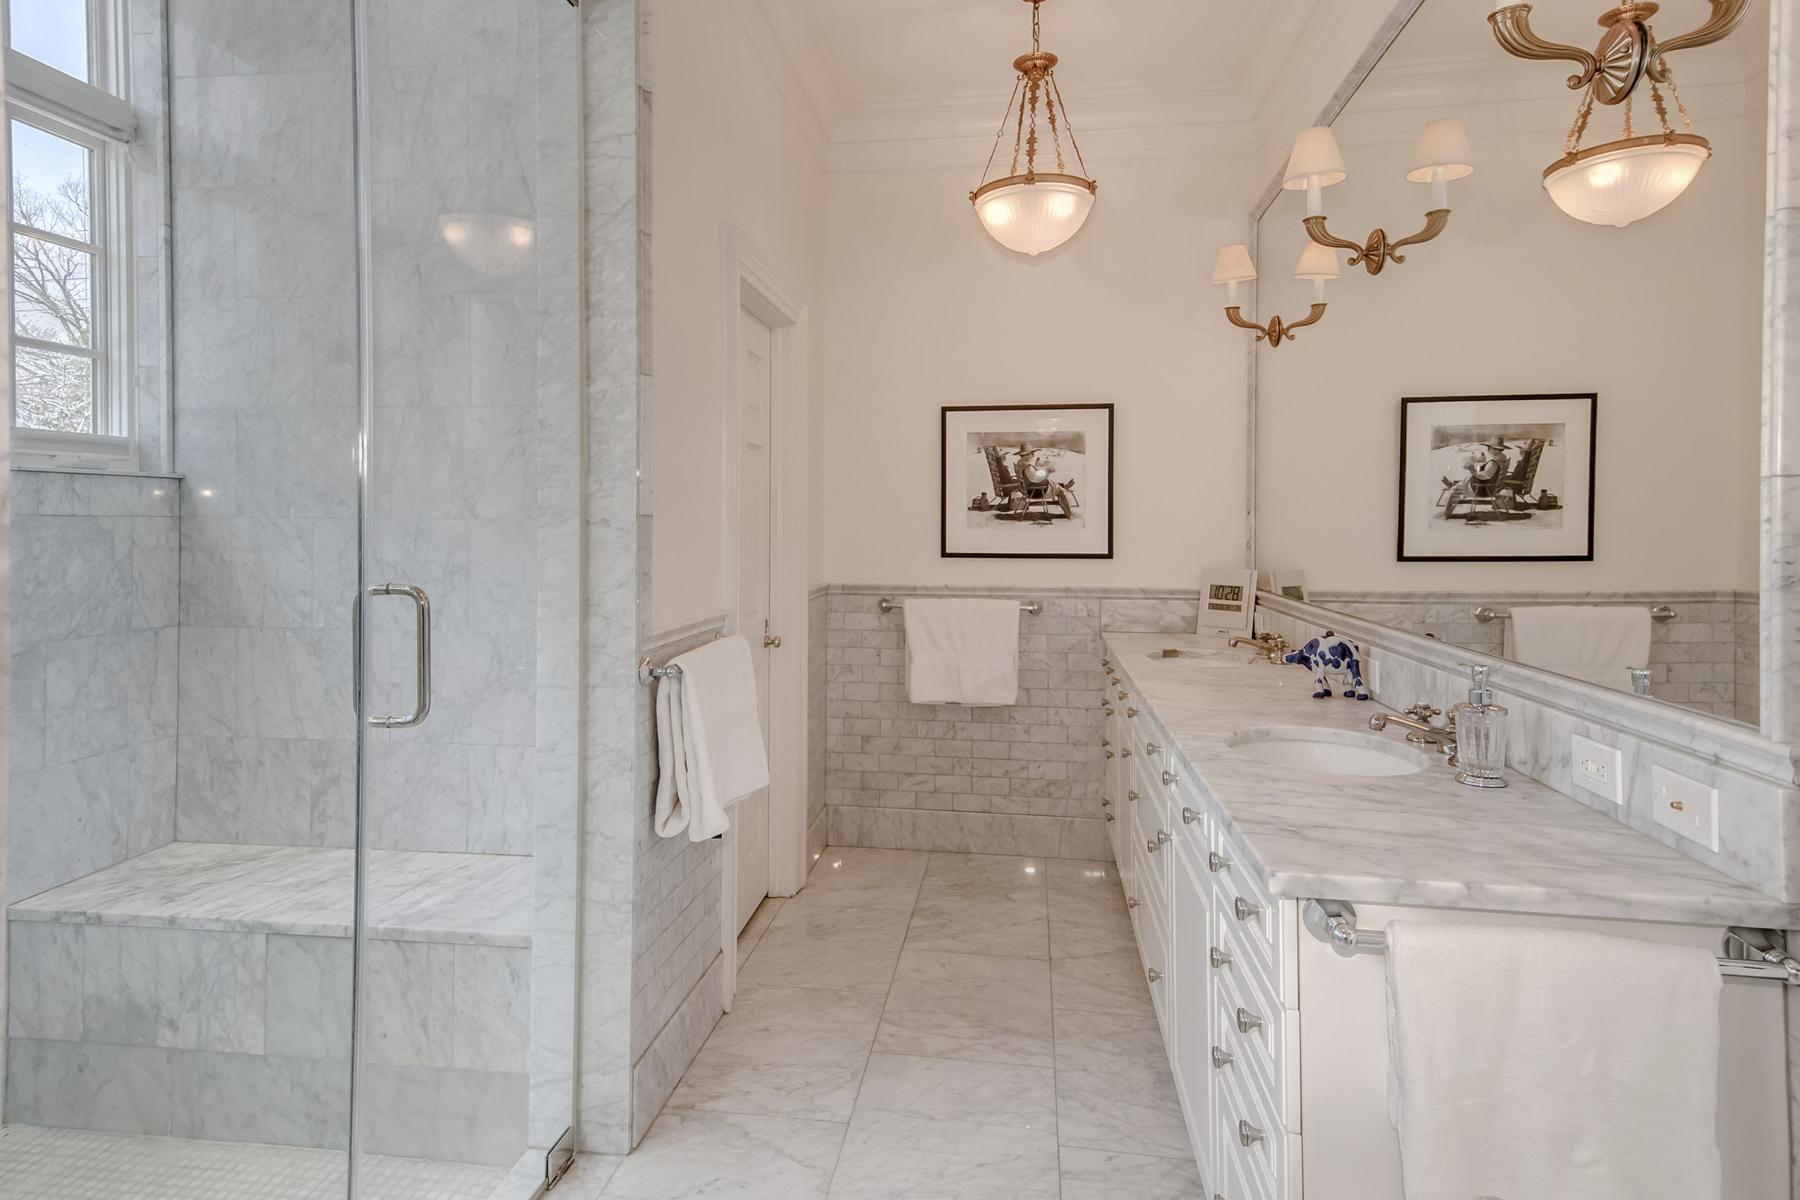 Additional photo for property listing at 3101 Chain Bridge Road Nw, Washington  Washington, District Of Columbia 20016 United States